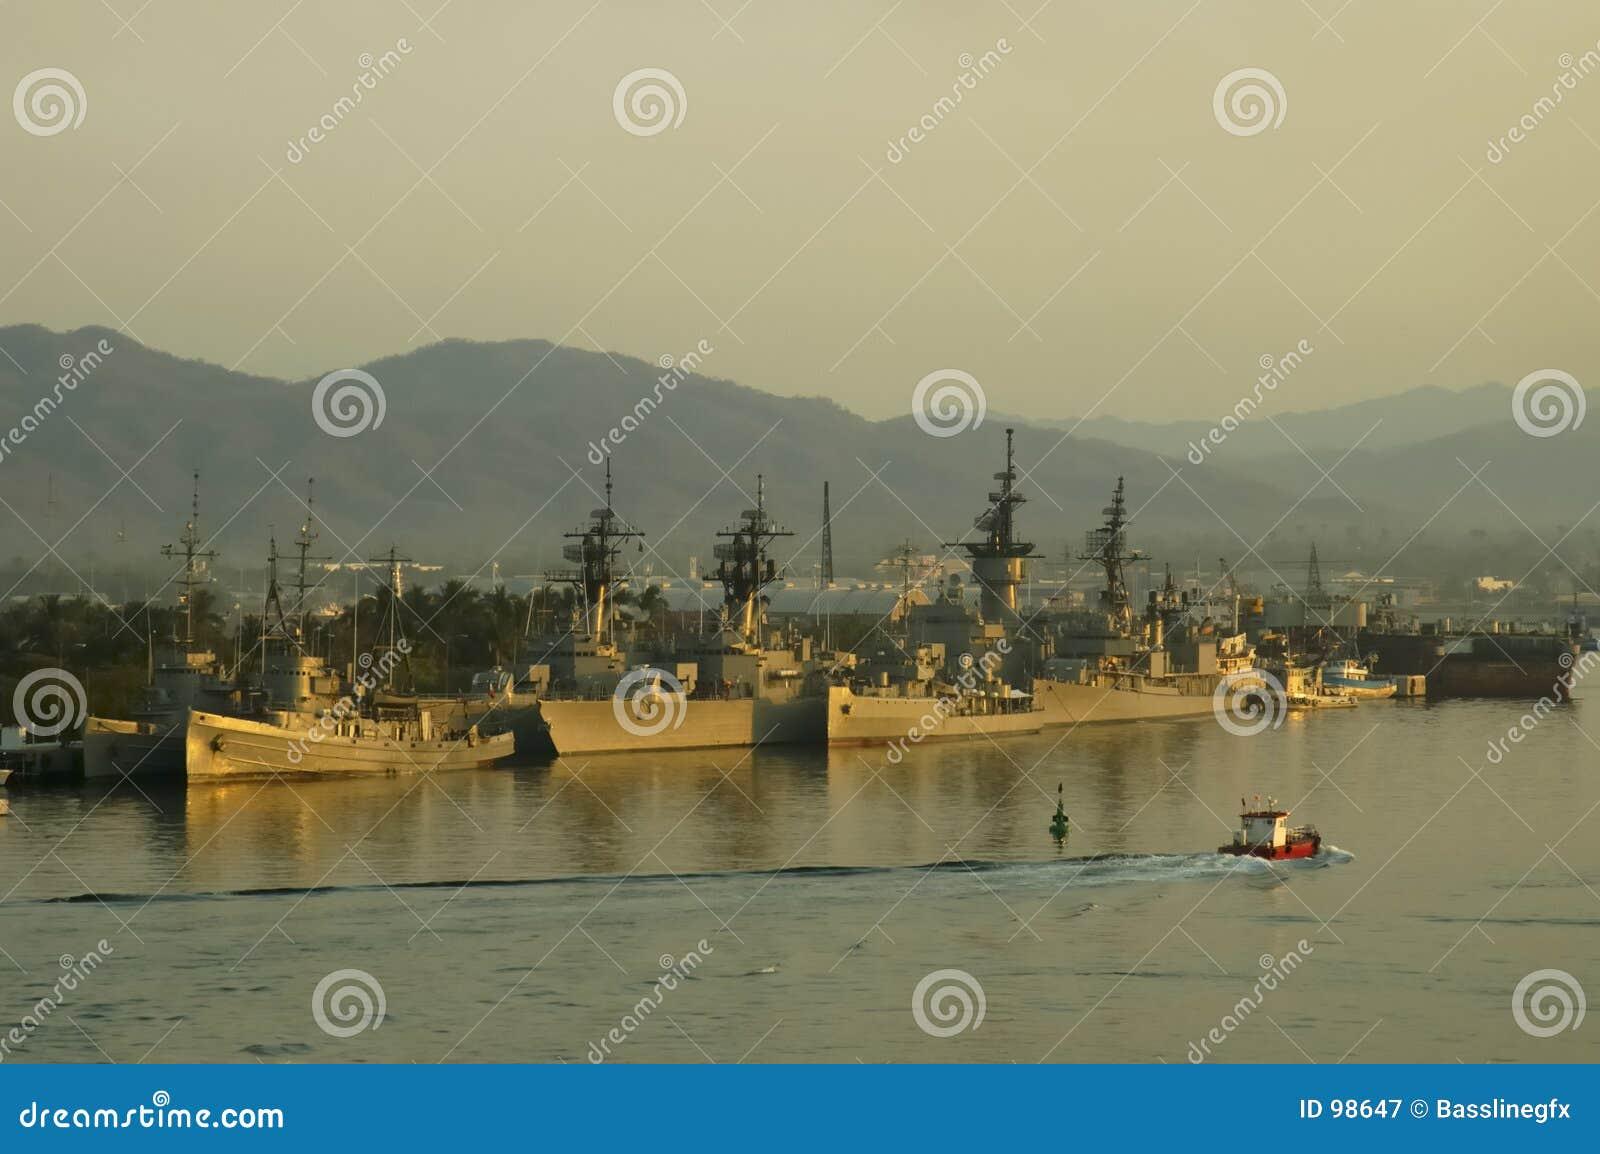 Military Ships Sunset